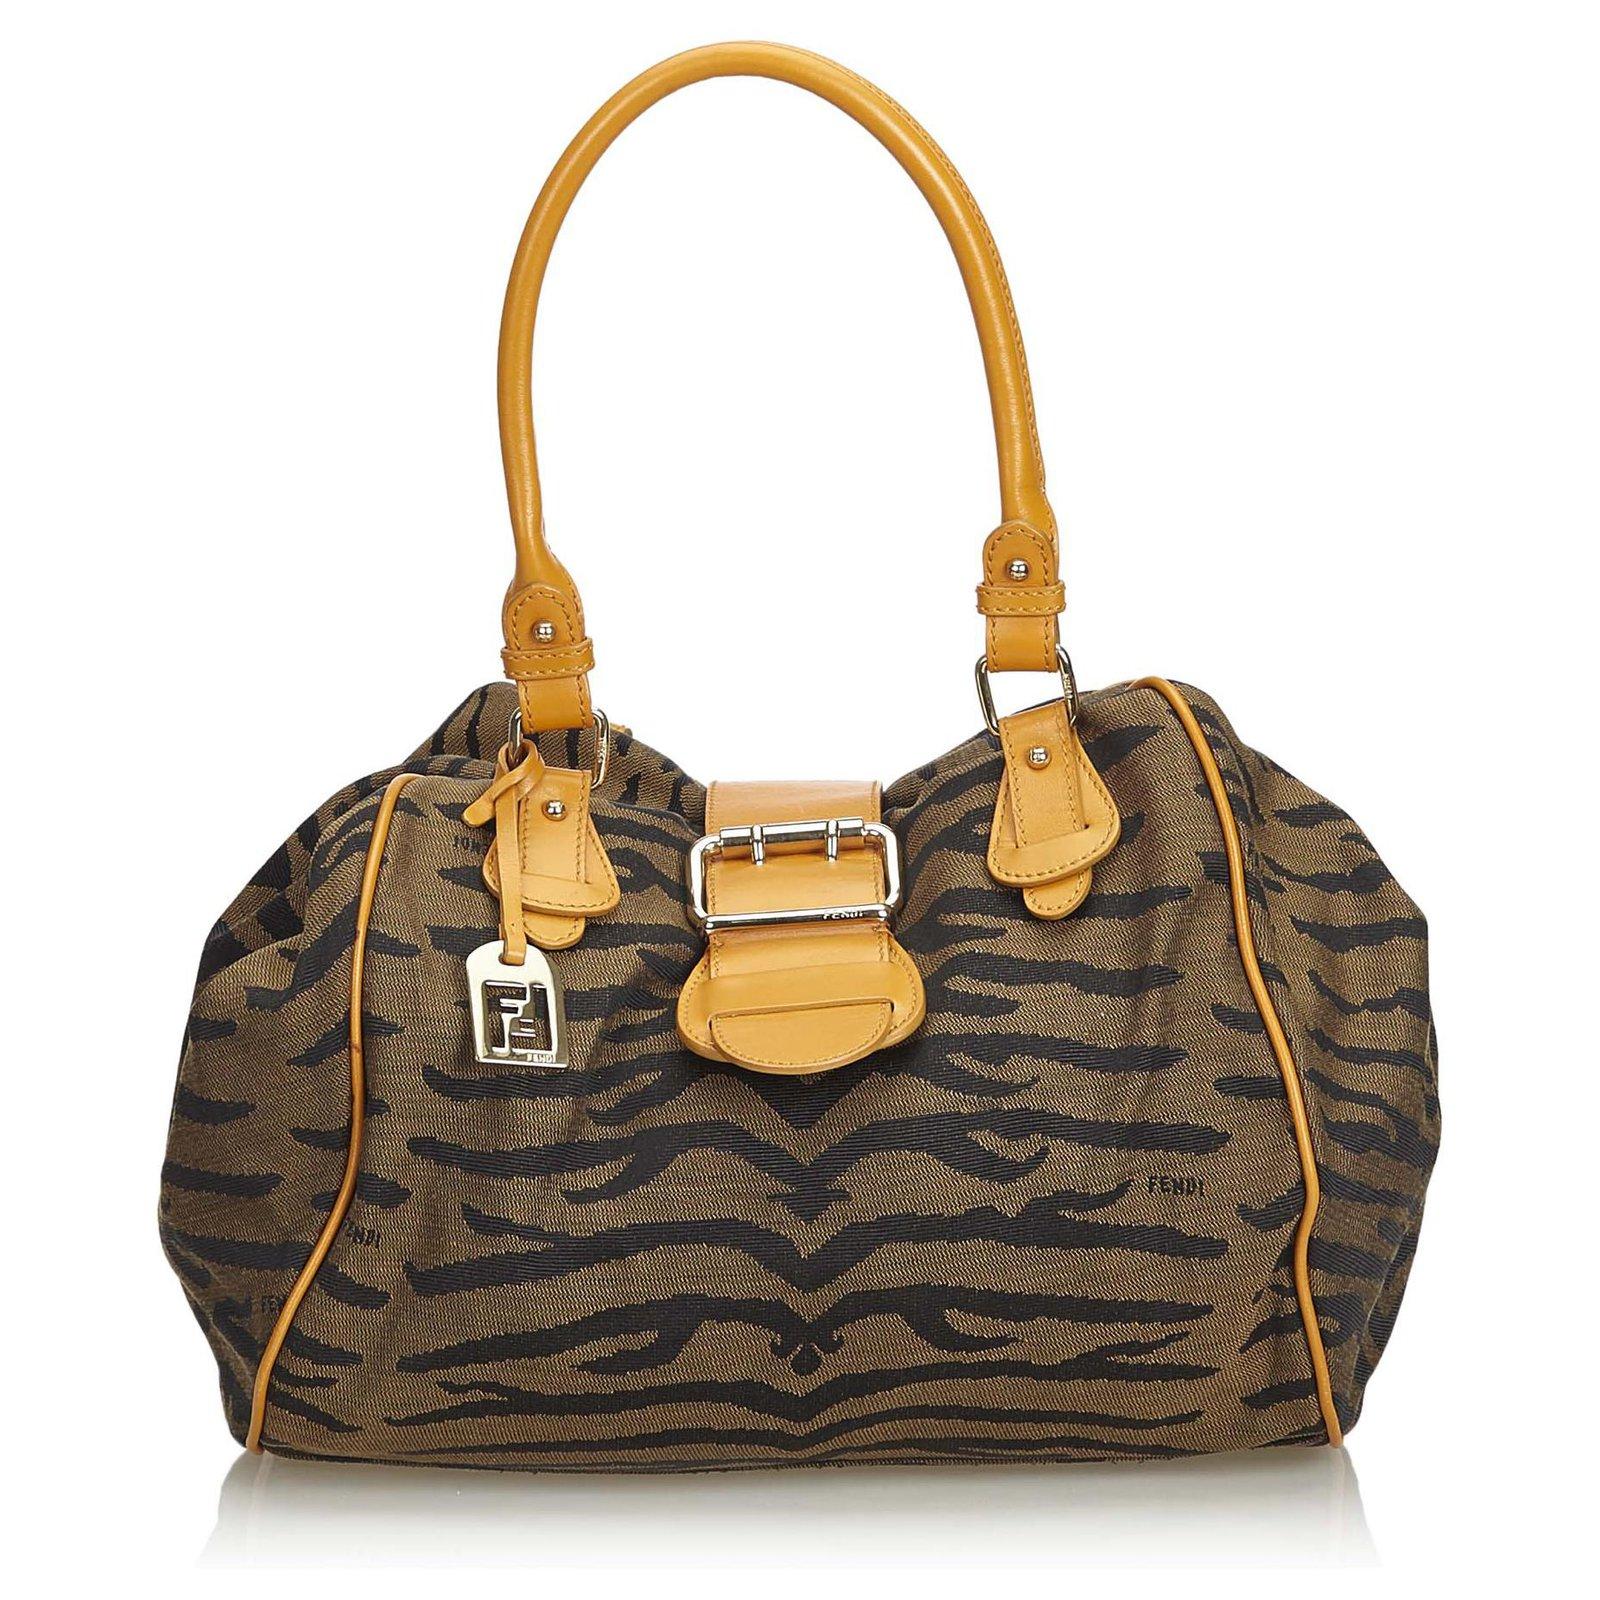 huge selection of newest cheap for discount Fendi Fendi Brown upperr Print Jacquard Handbag Handbags Leather ...